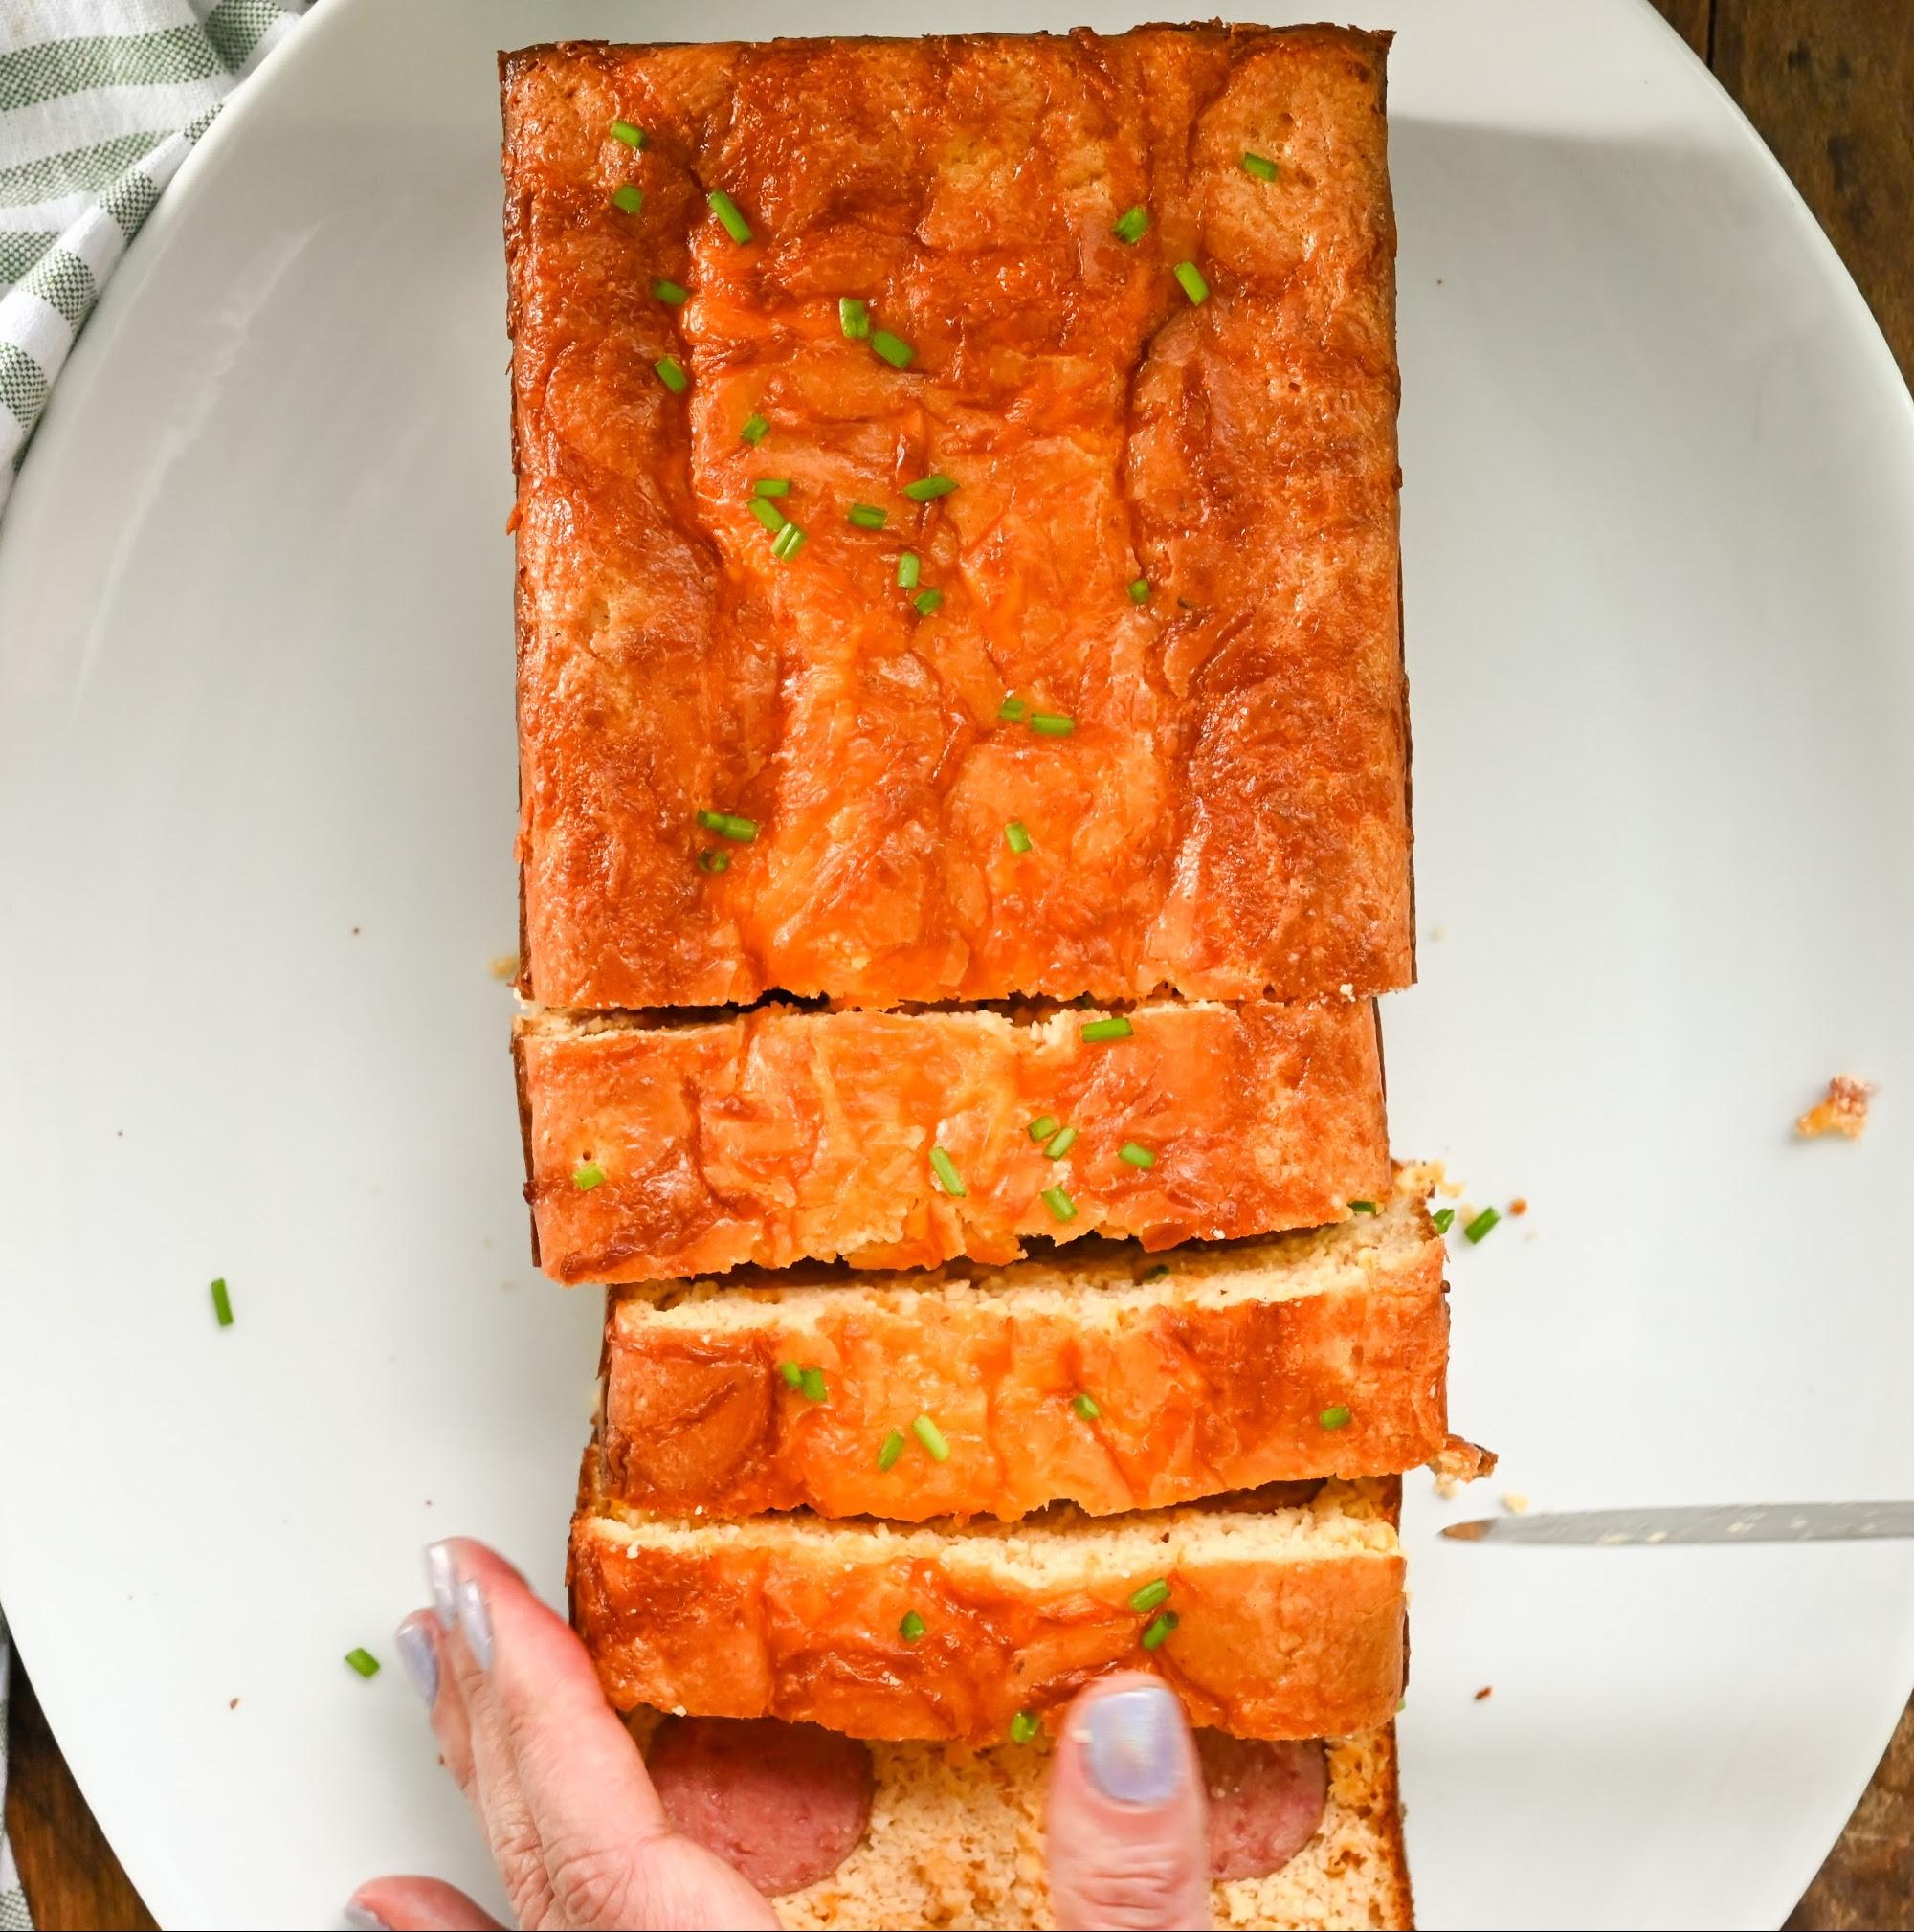 keto kielbasa cornbread loaf being sliced